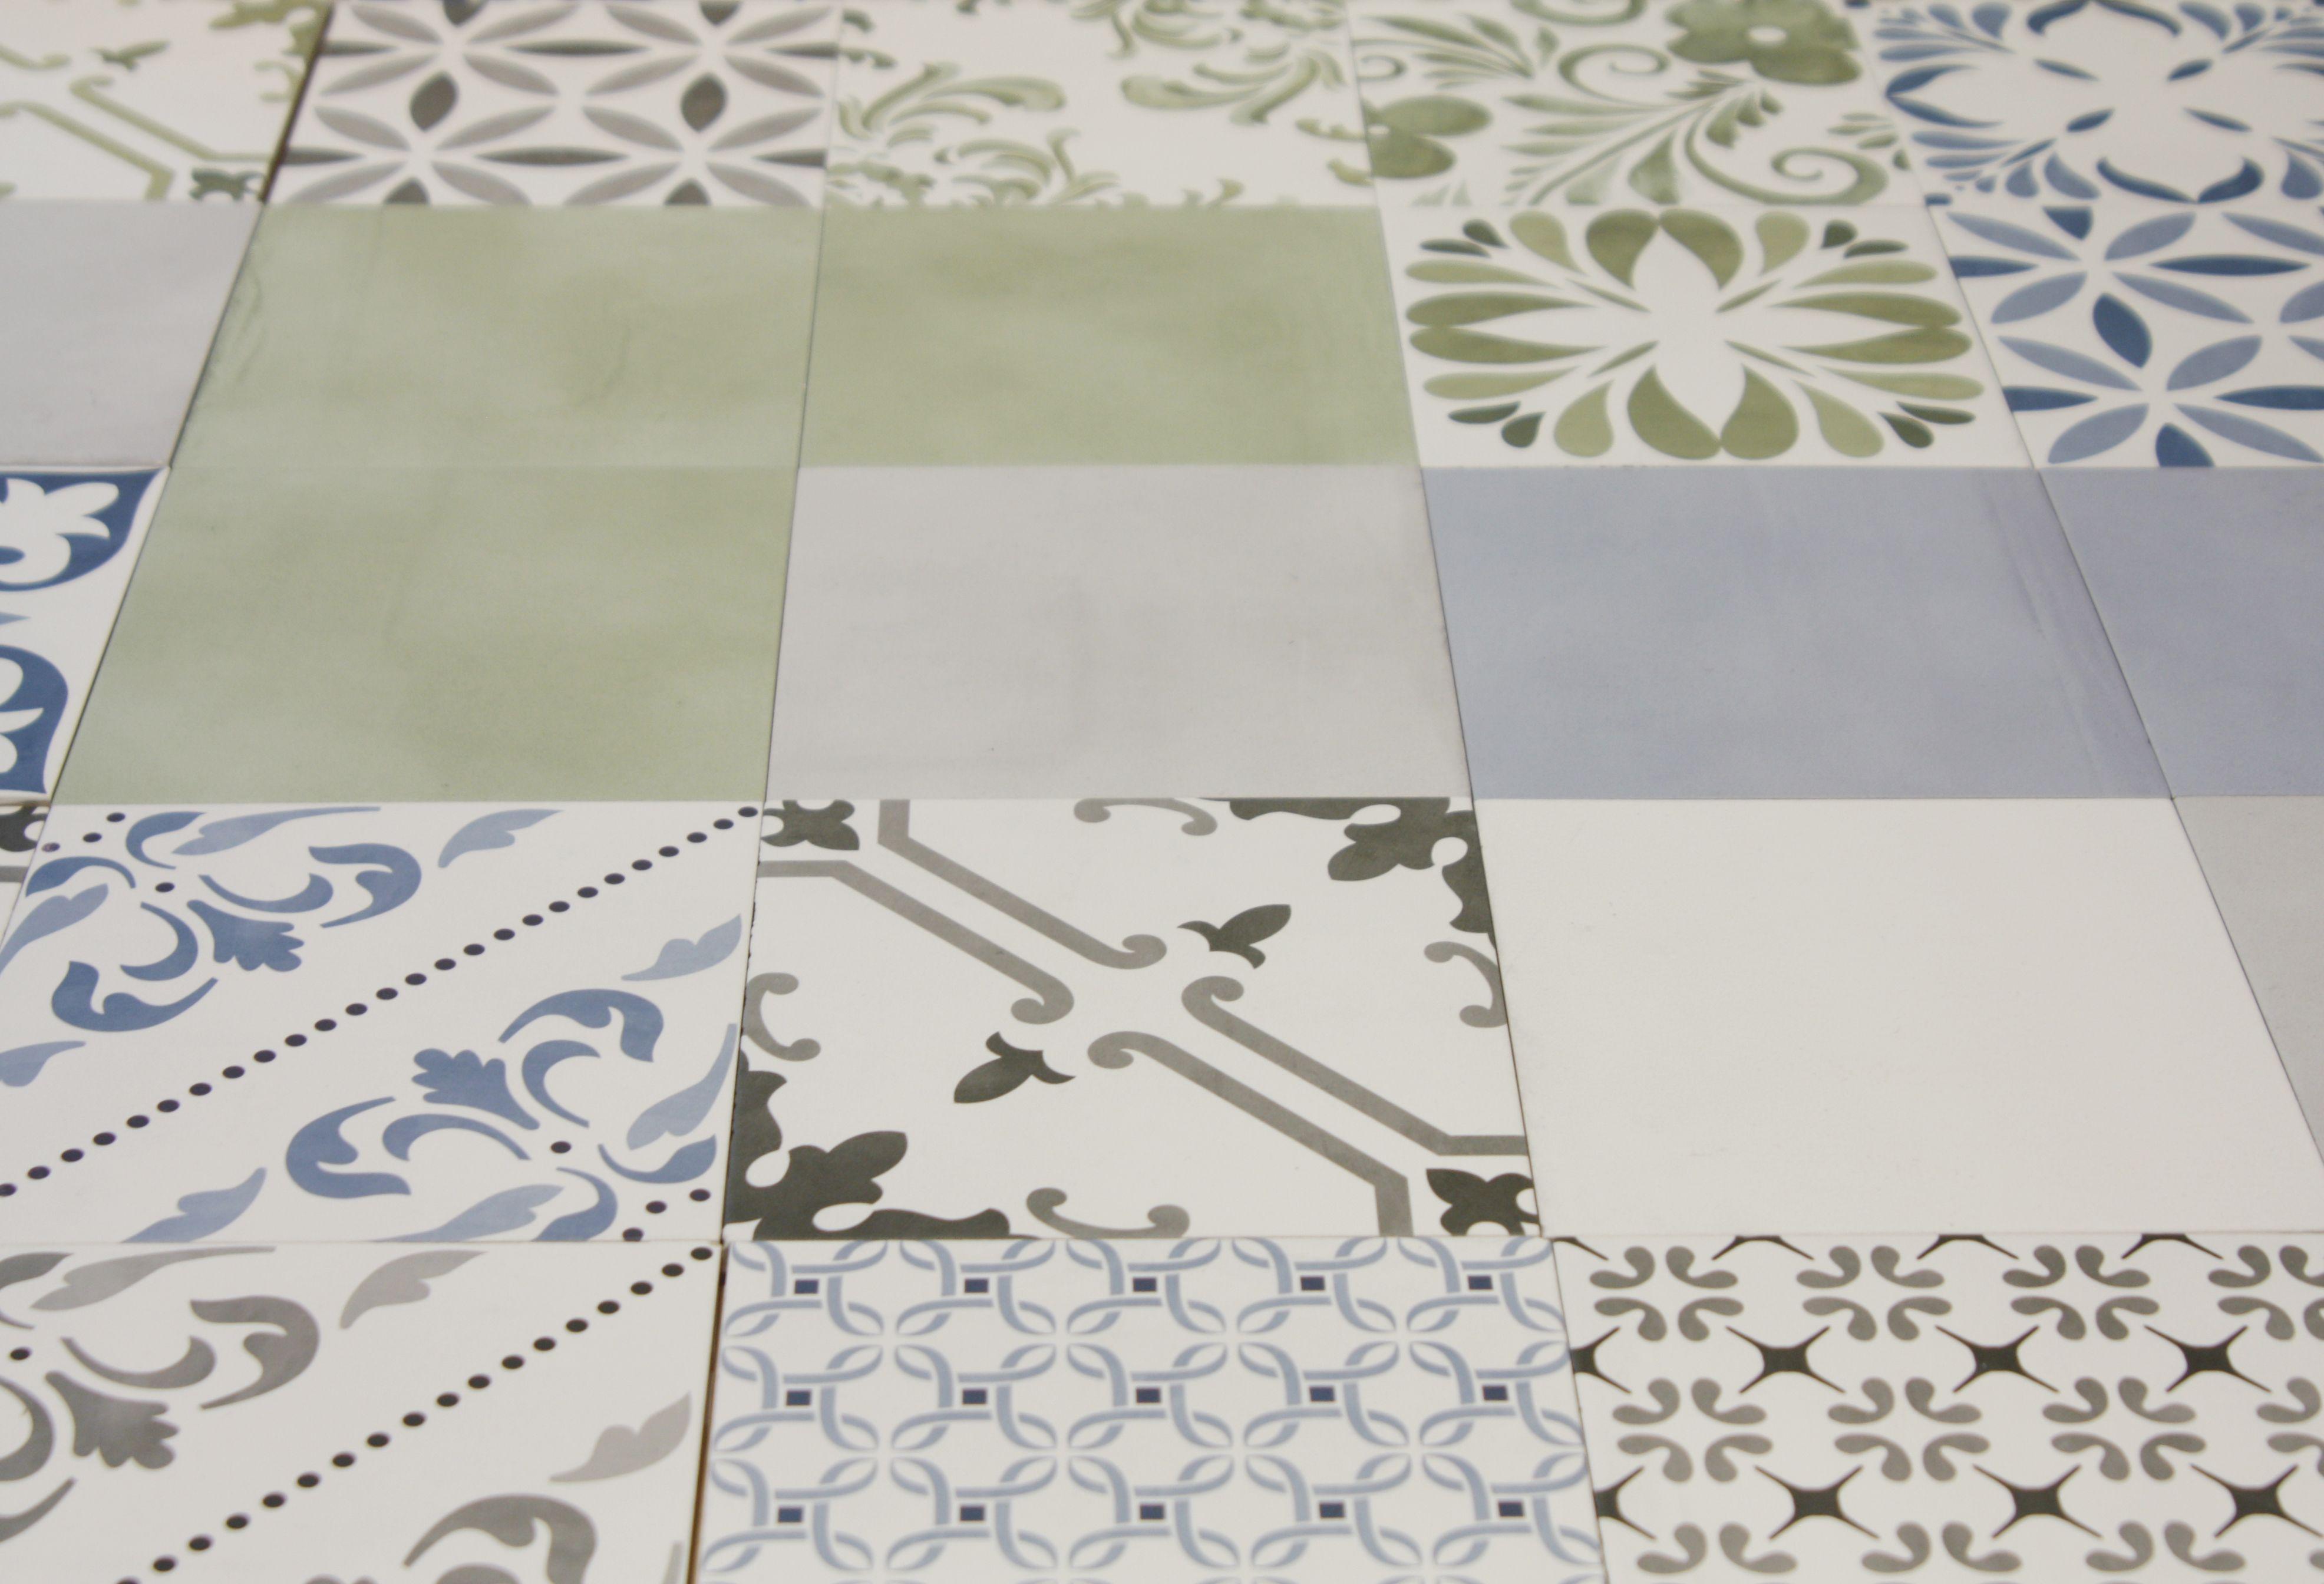 Tonalite aquarel nostalgia ceramica 1950s tiles